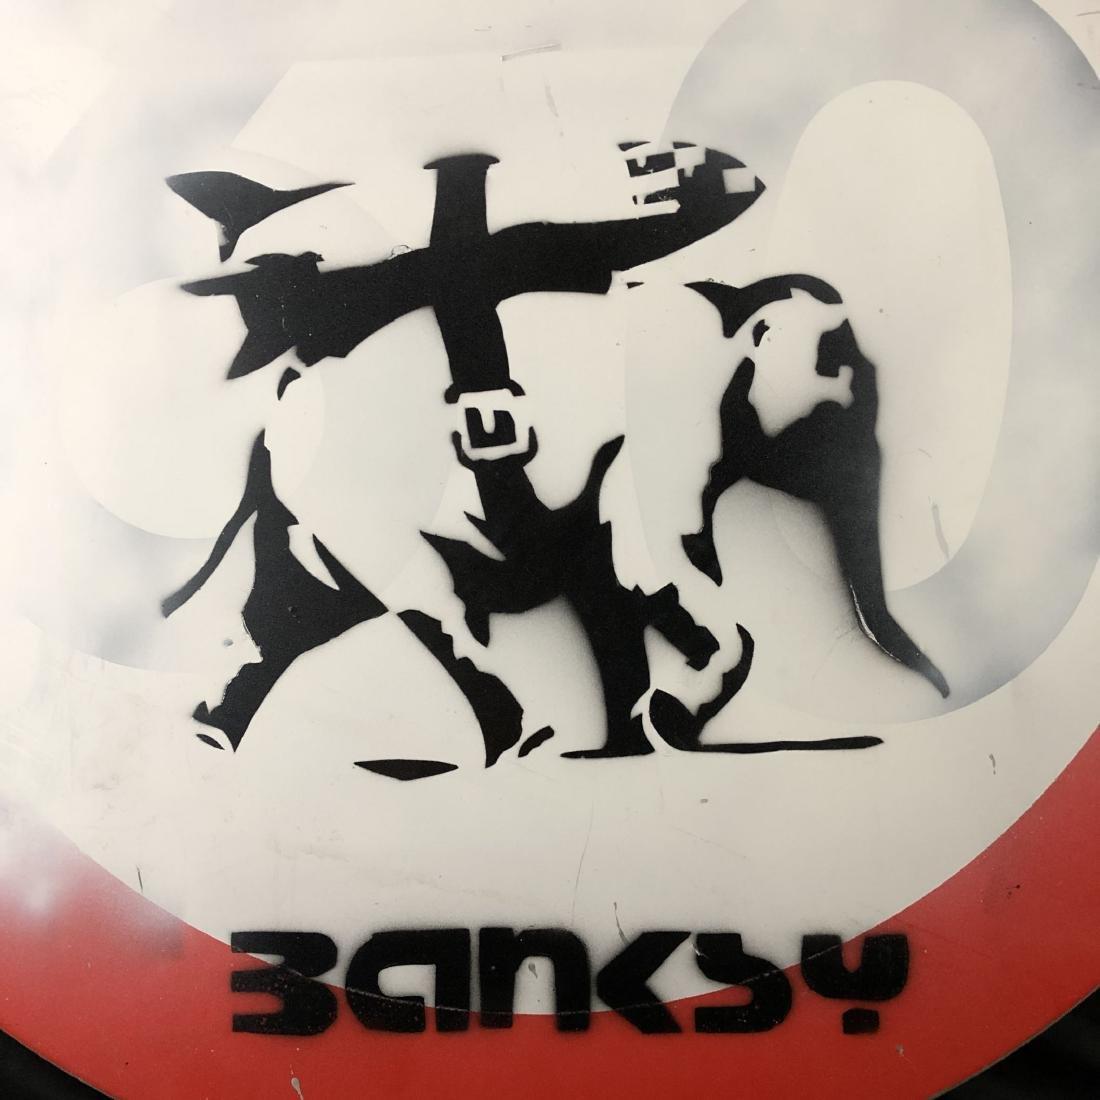 Banksy (British, 1974- ) - Graffiti Painting - style of - 2